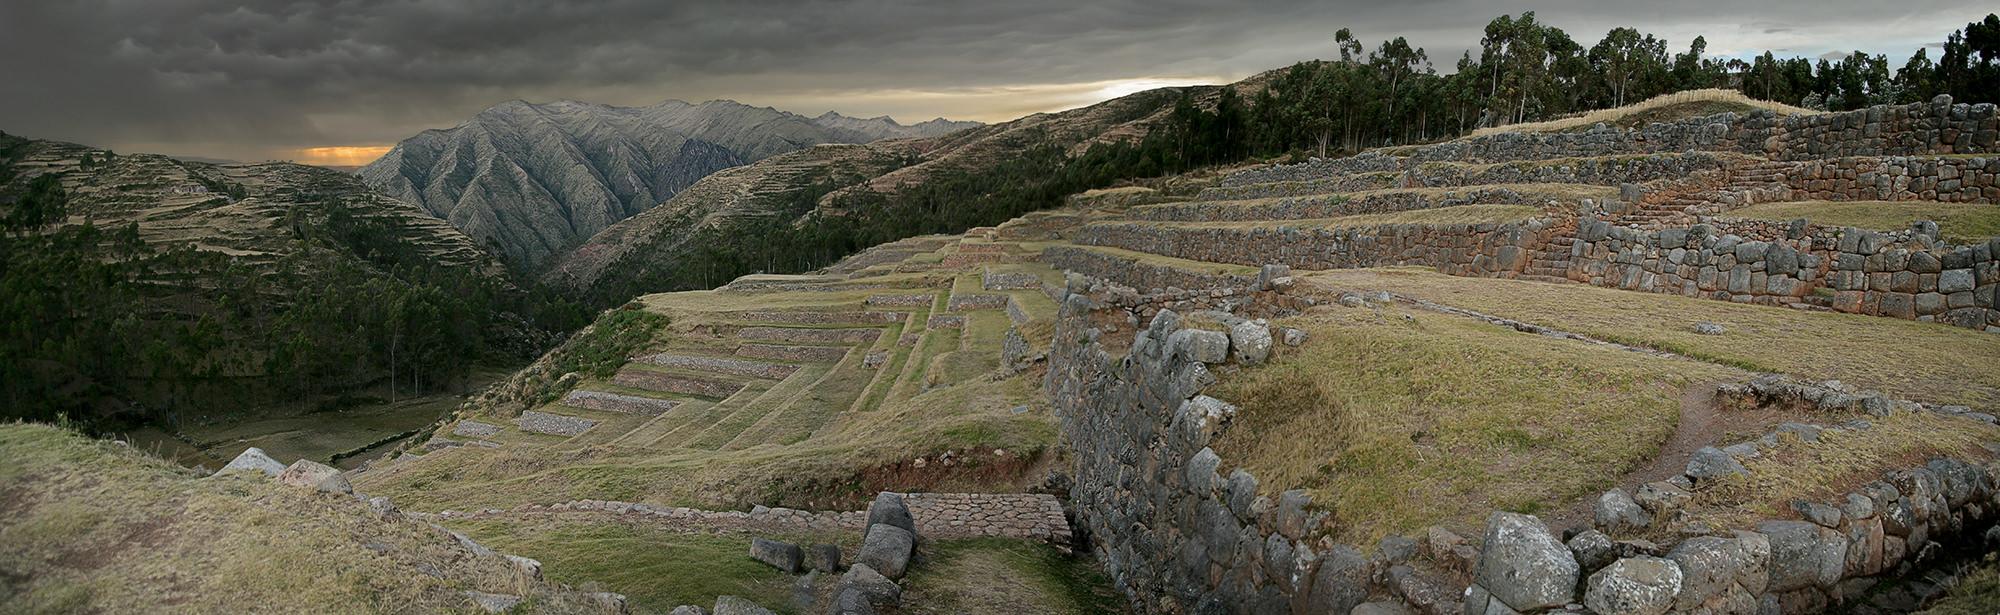 Chinchero Terraces